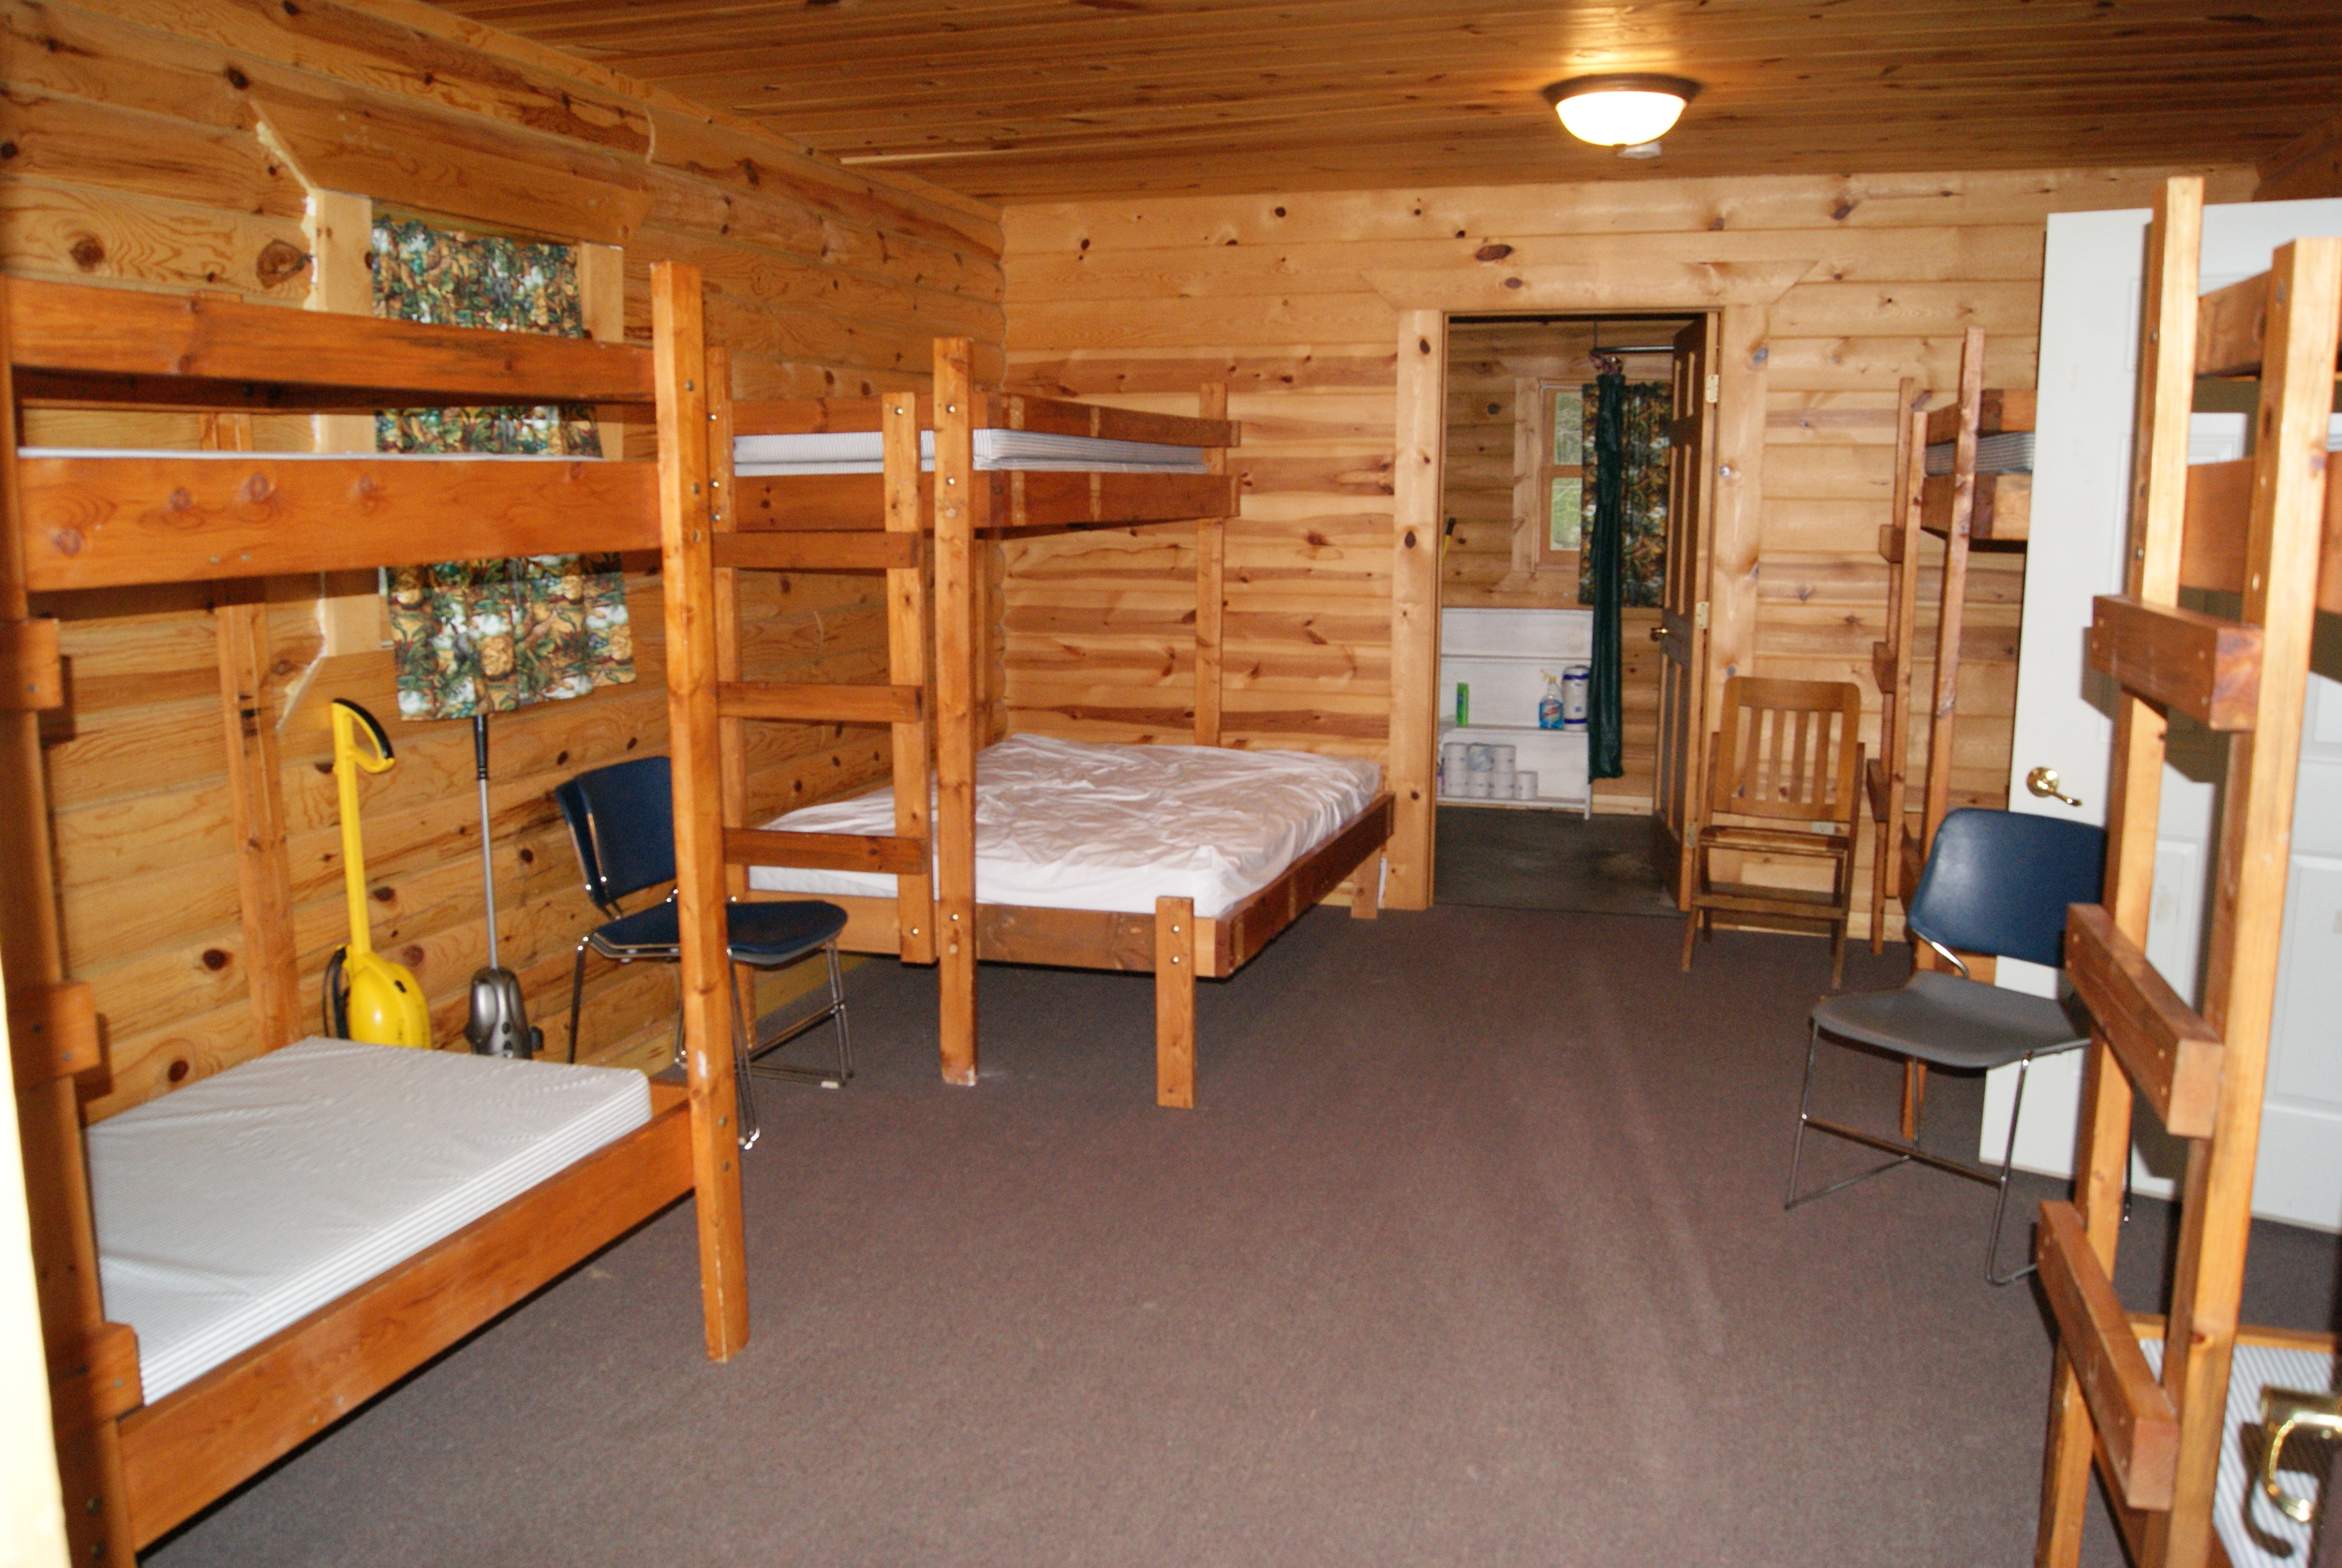 Interior of dorm room